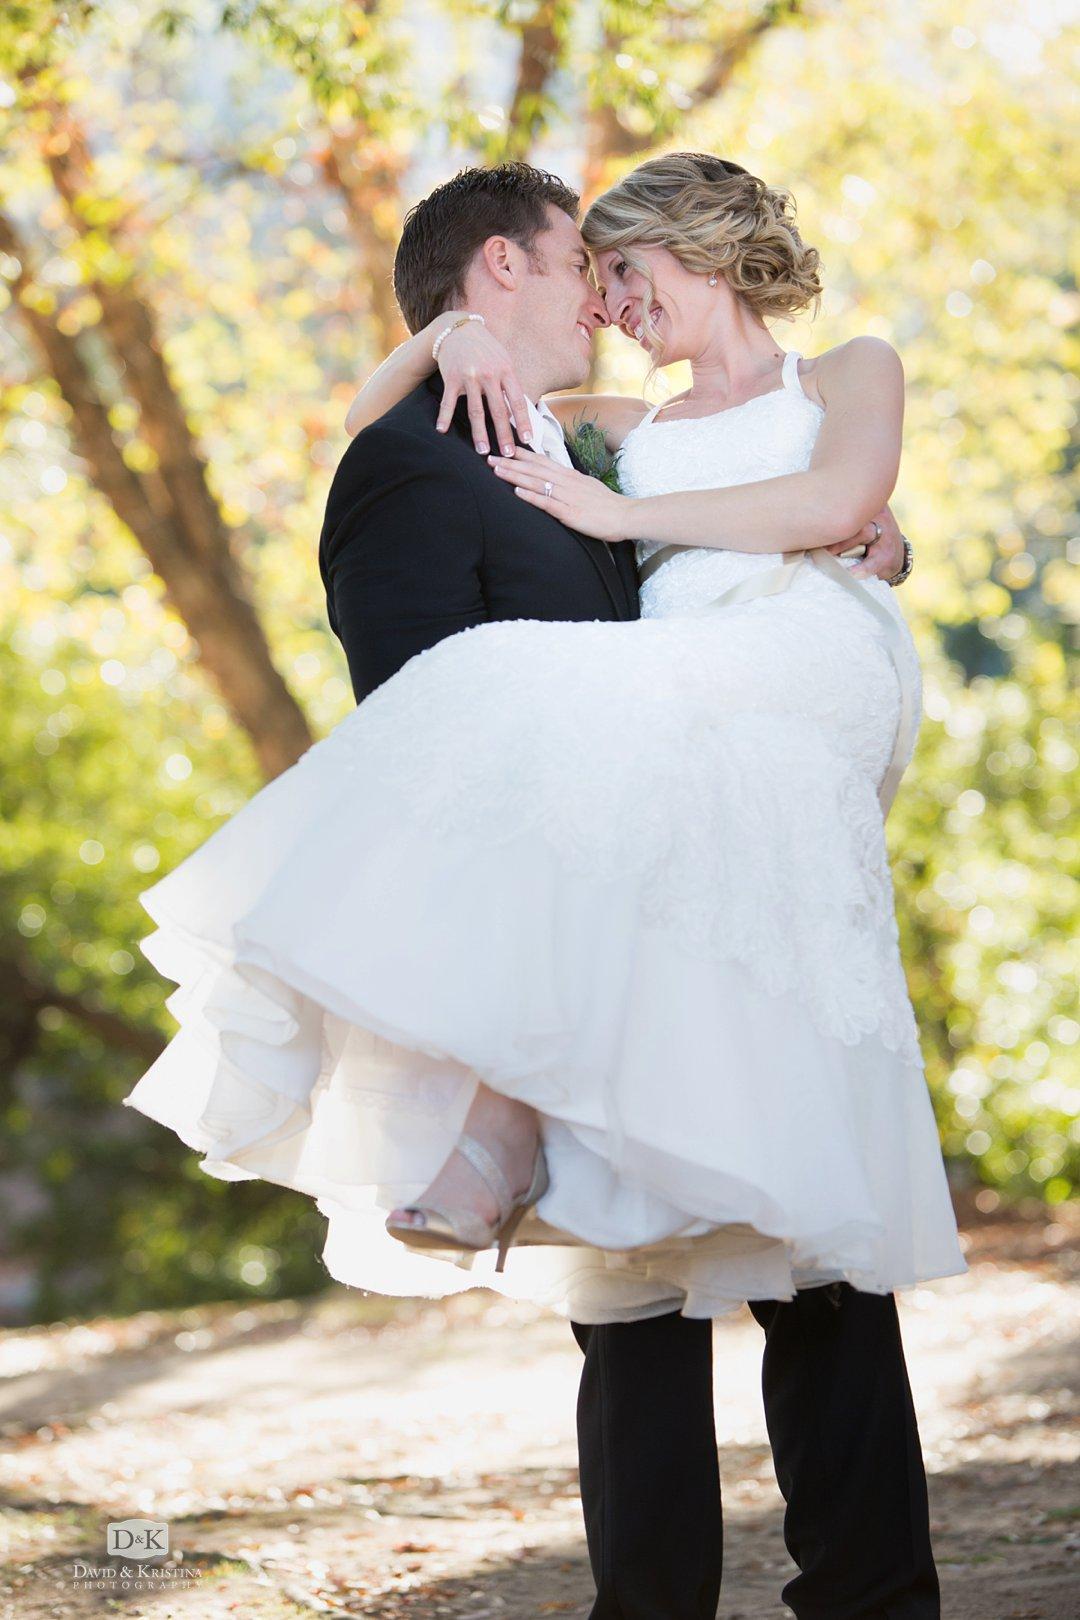 Bride and groom at Falls Park wedding photo